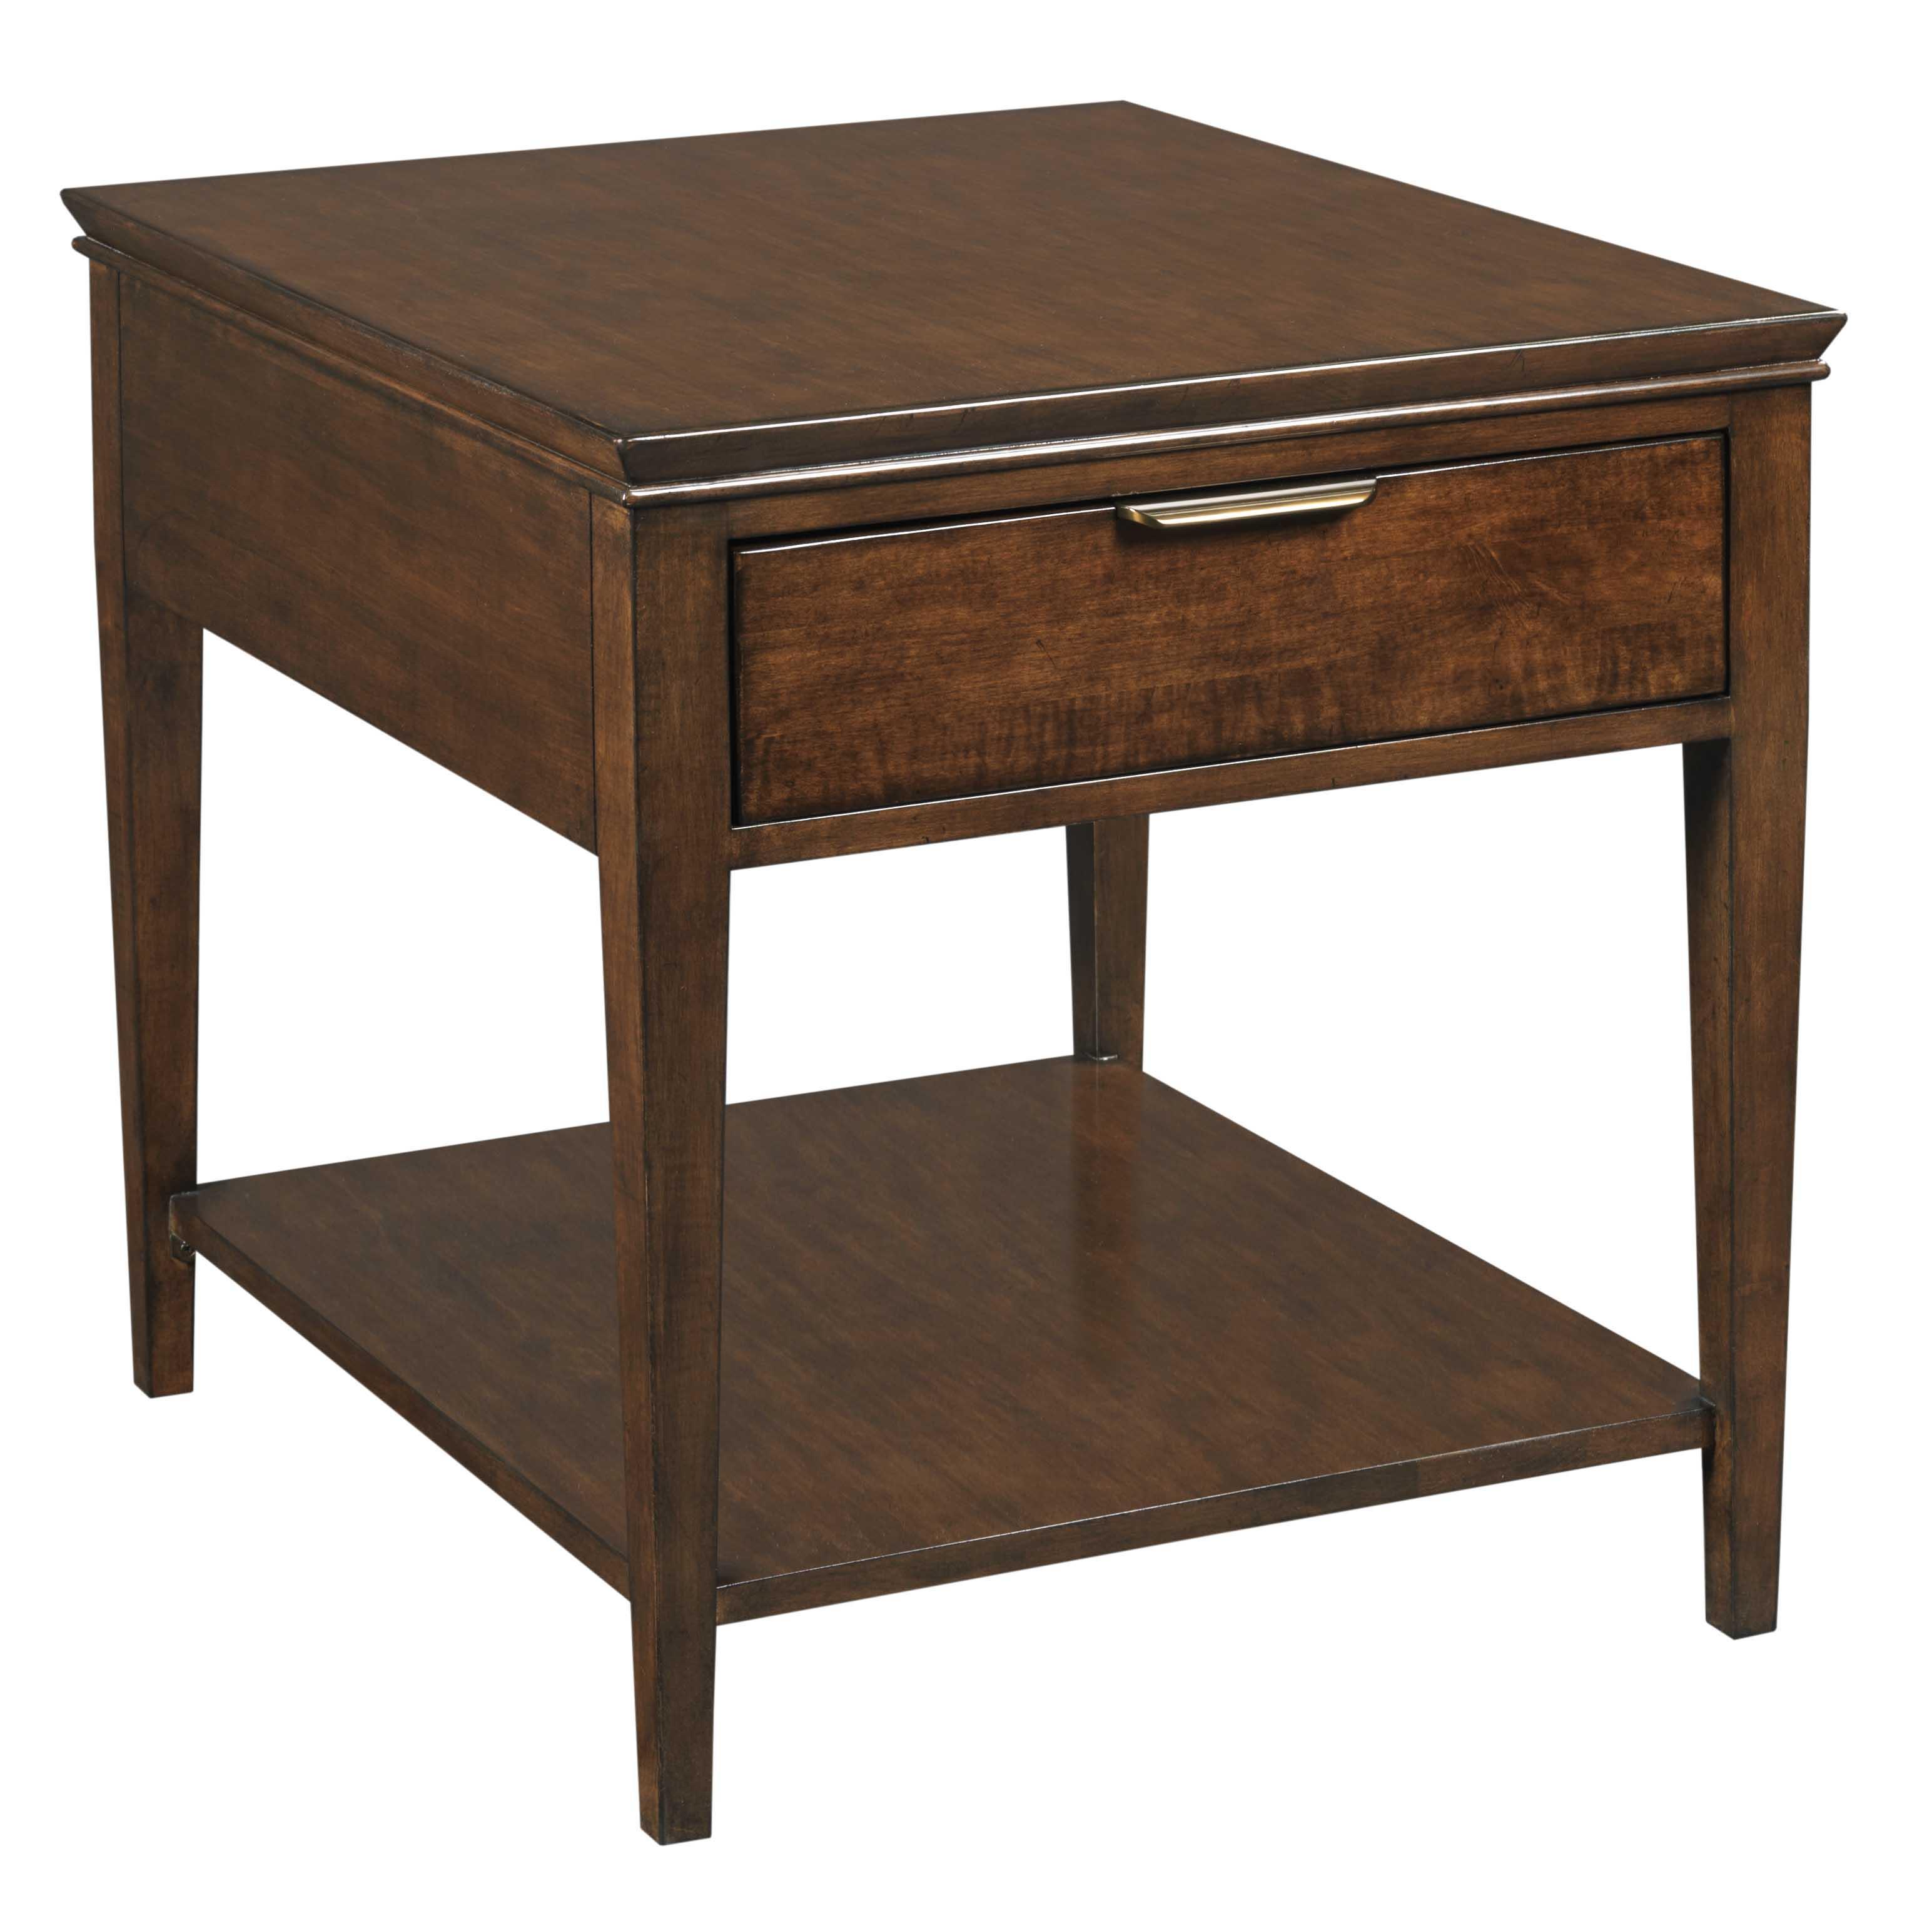 Elise Elise End Table by Kincaid Furniture at Johnny Janosik